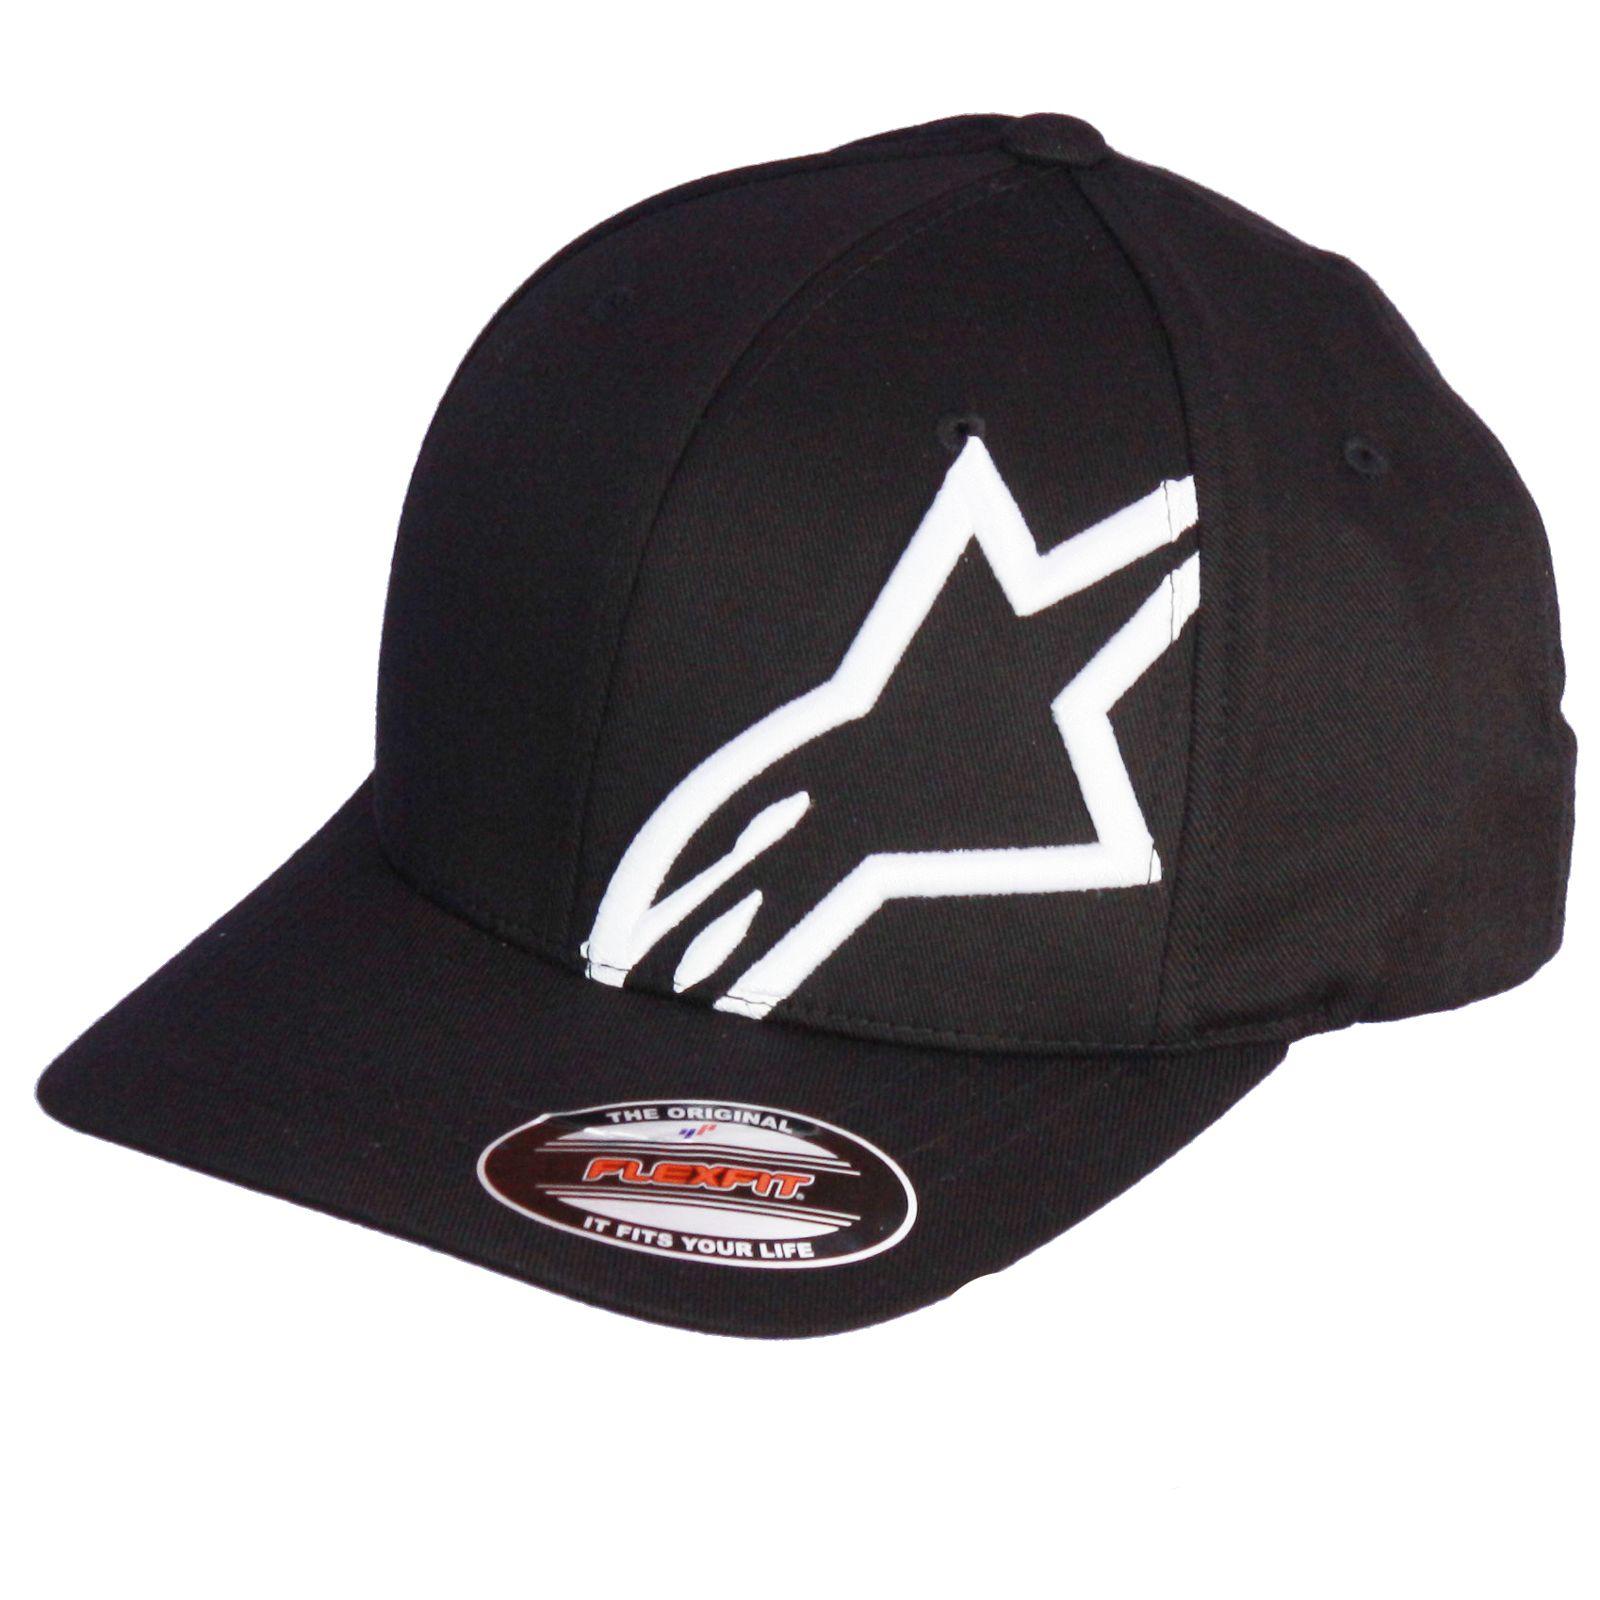 Alpinestars-Medium-Curve-Flexfit-Cap-Corp-Shift2-Flexfit-Black